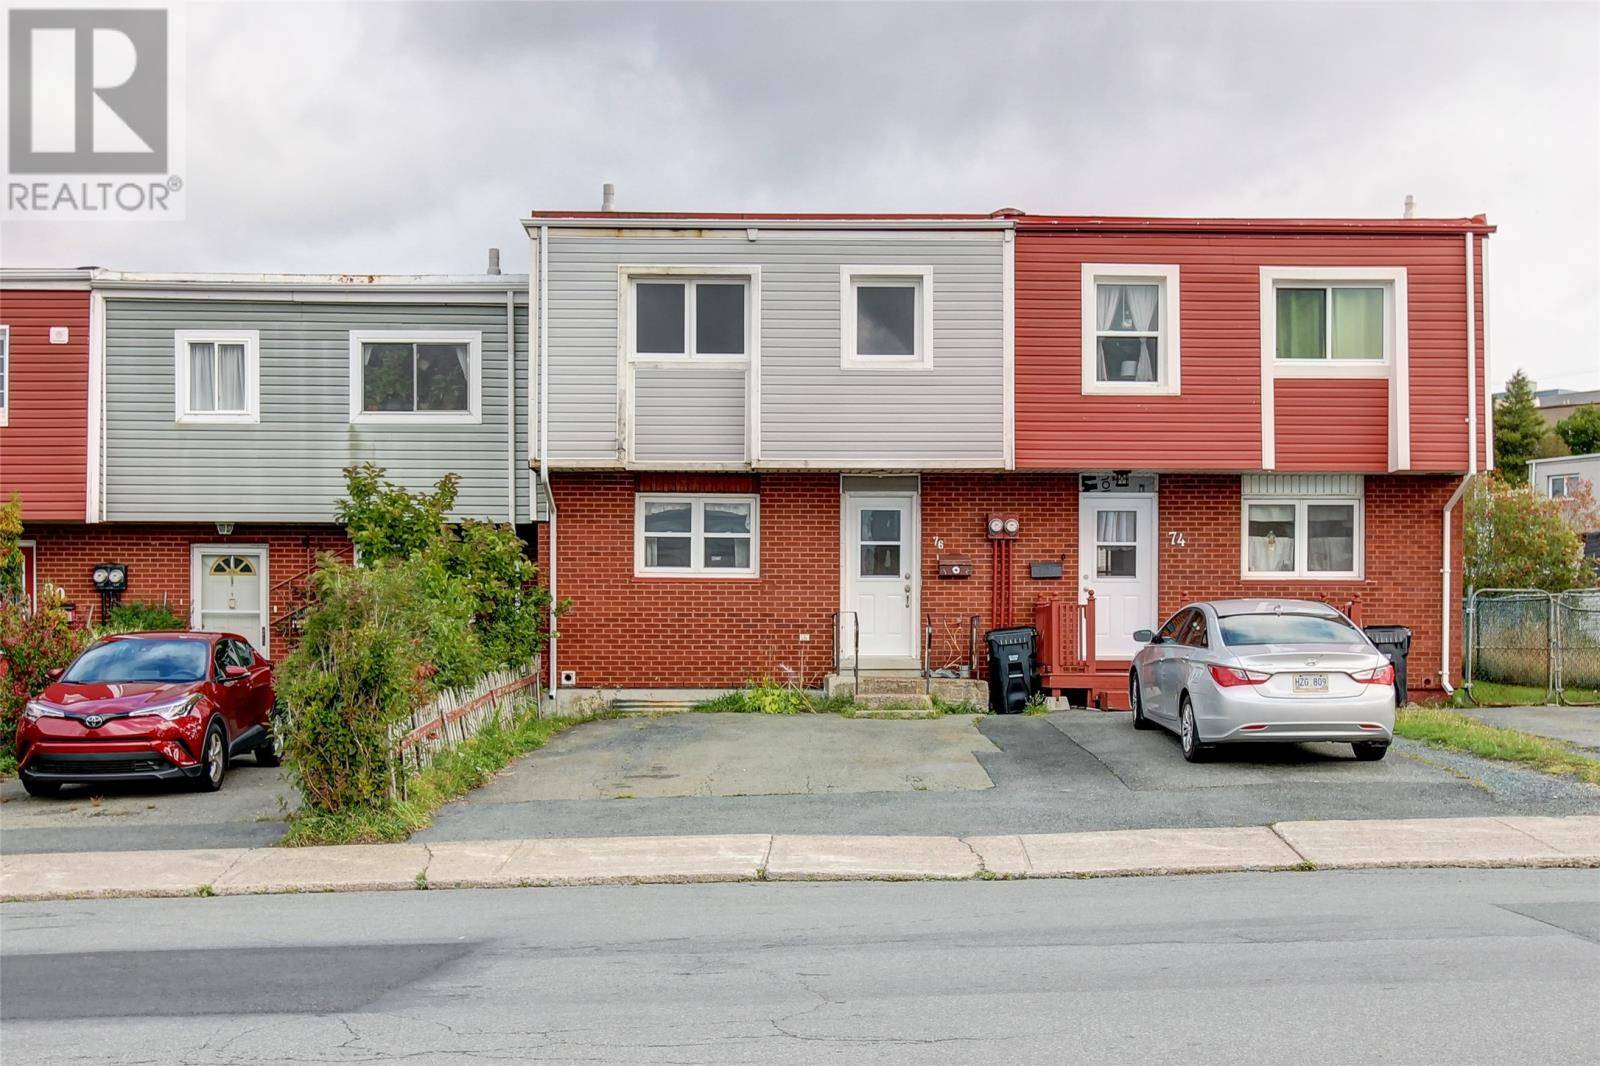 House for sale at 76 Newfoundland Dr St. John's Newfoundland - MLS: 1204655